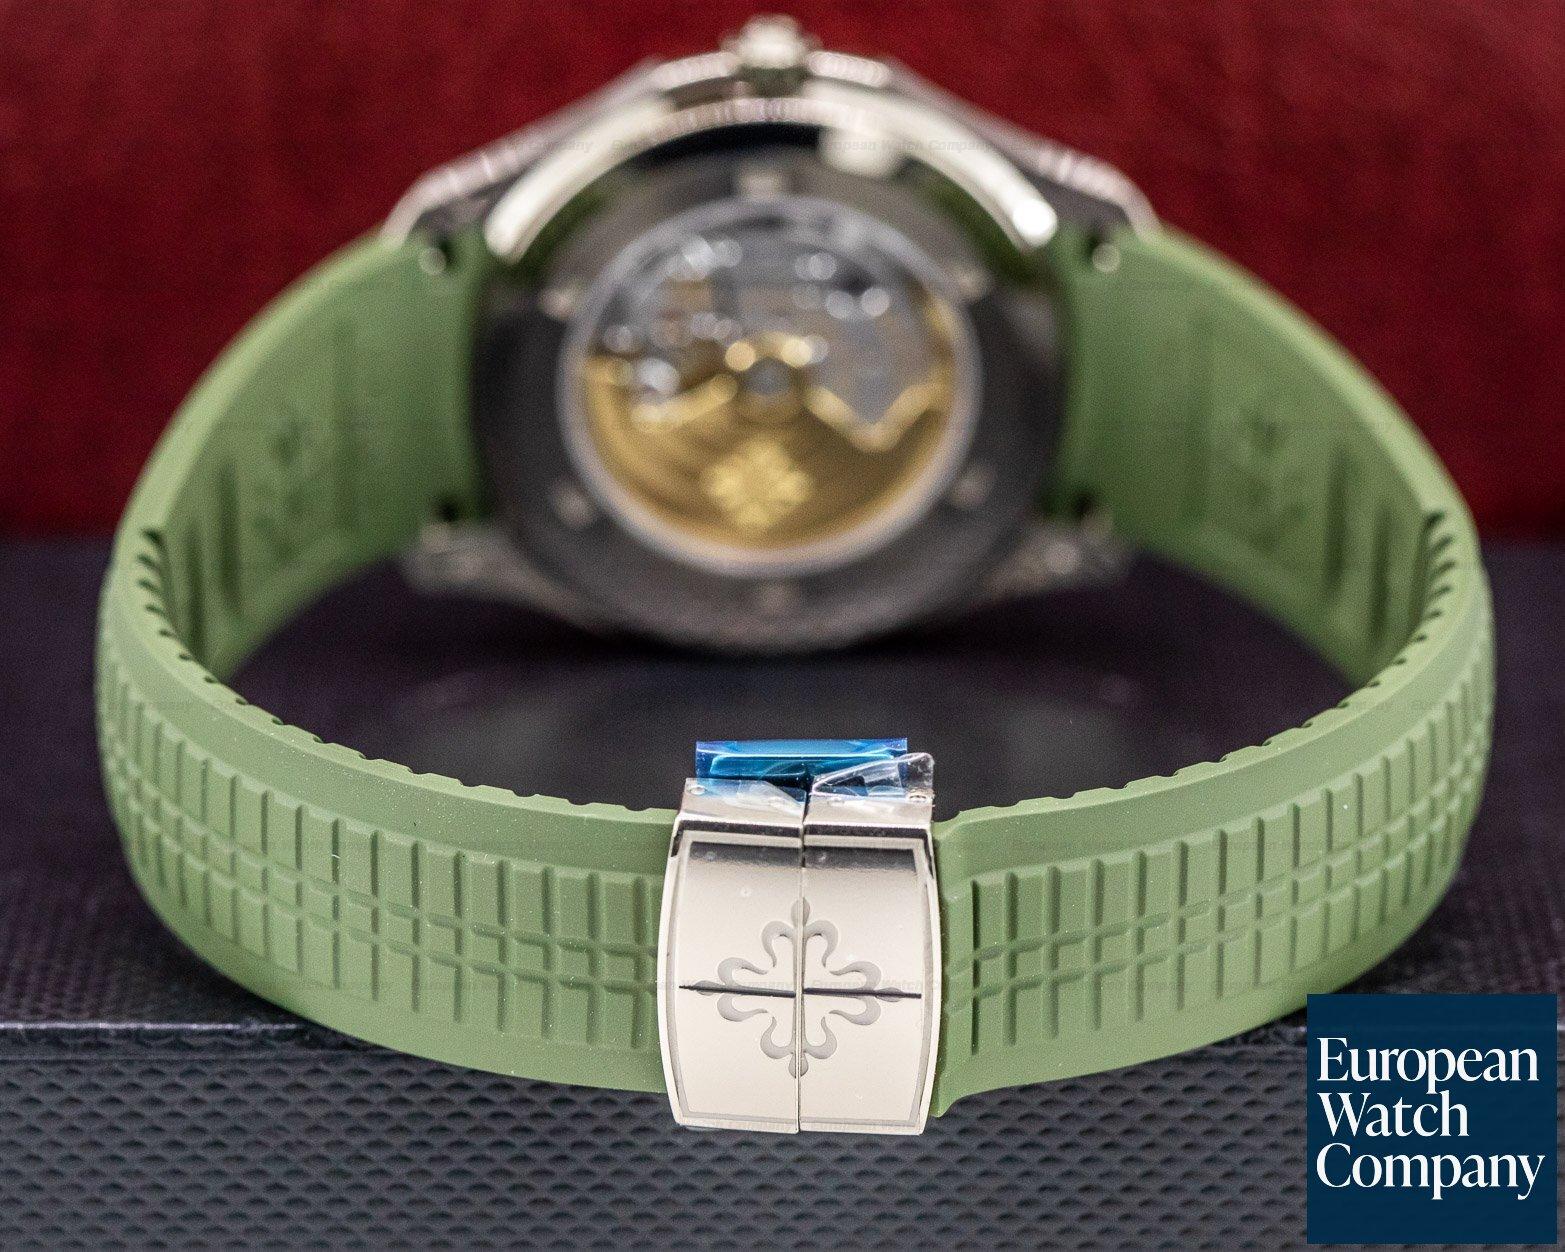 Patek Philippe 5168G-010 Aquanaut 18K White Gold / Khaki Green Dial UNWORN